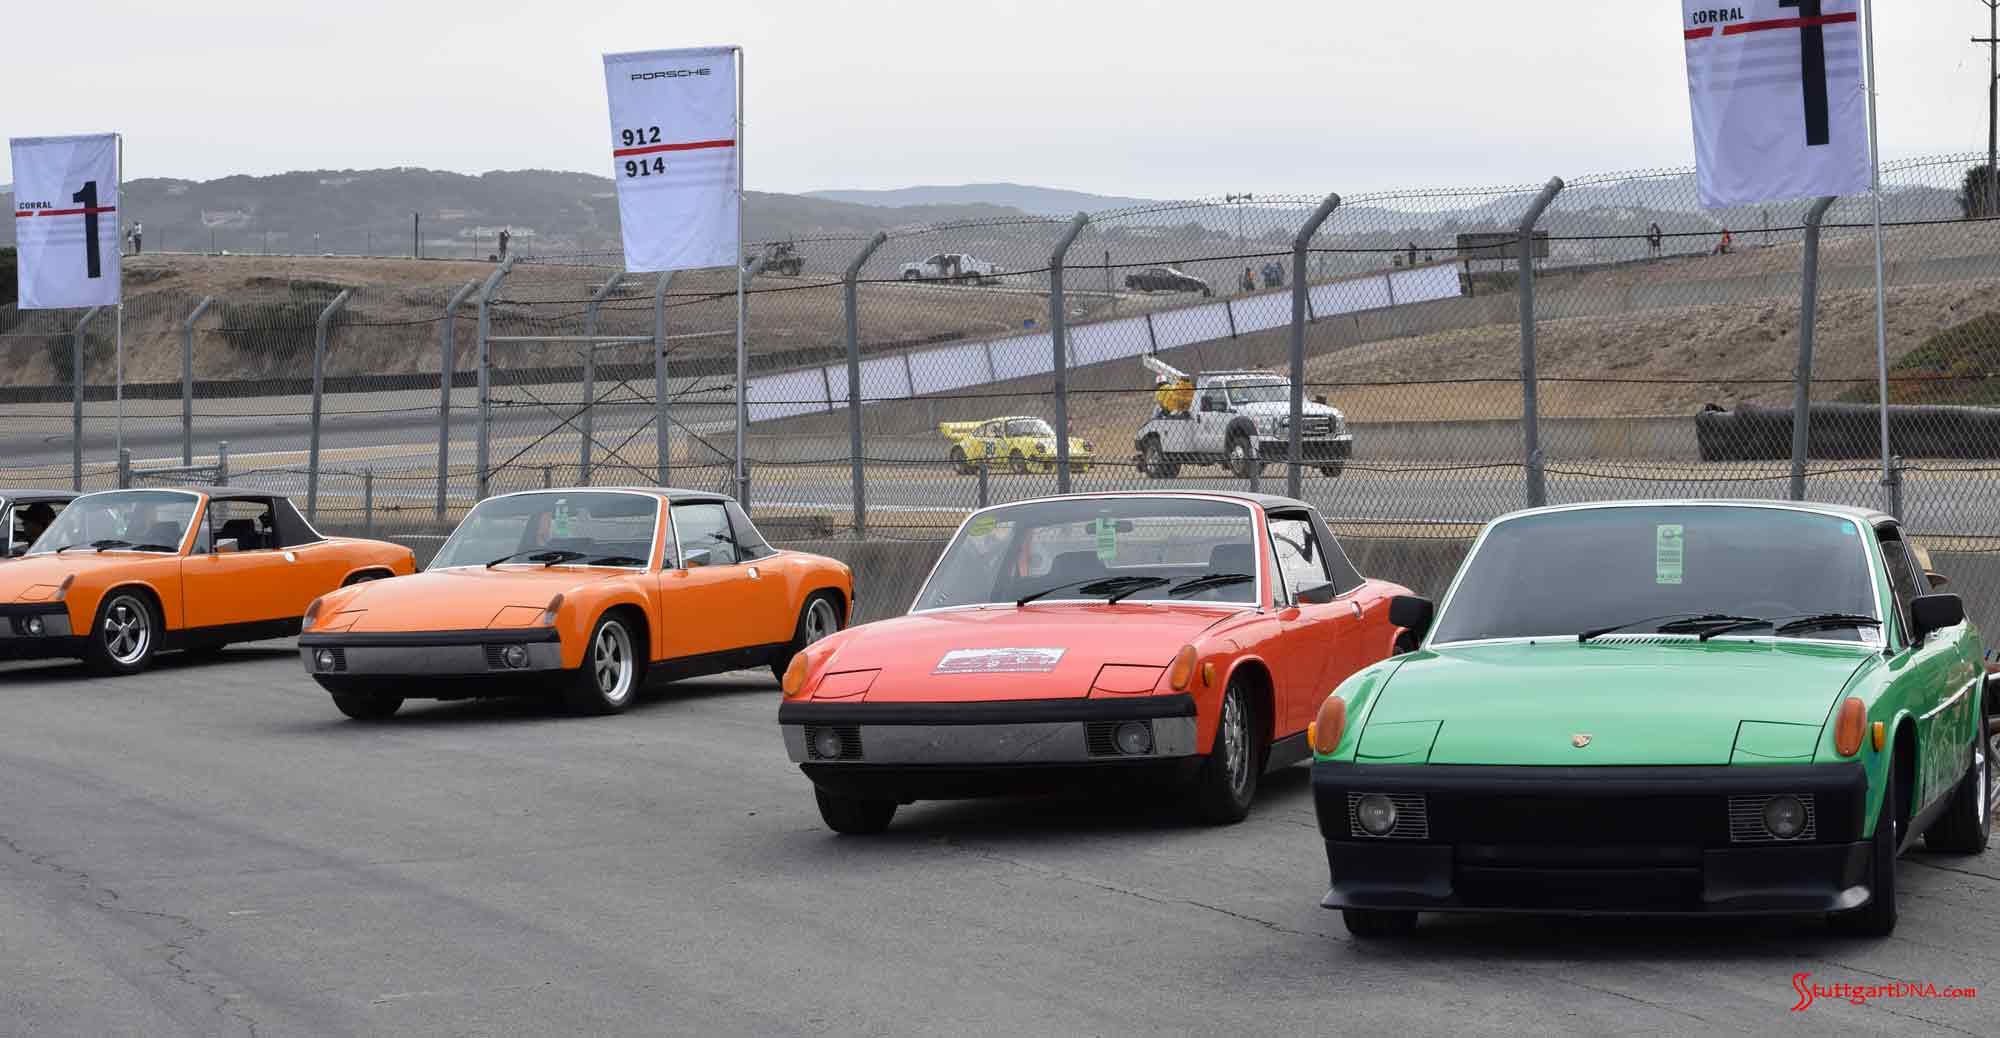 Porsche 914 Okteenerfest: We're at the 914 Corral at 2015 Porsche Rennsport Reunion V, captuing 4 fine 914 specimens. Credit: StuttgartDNA